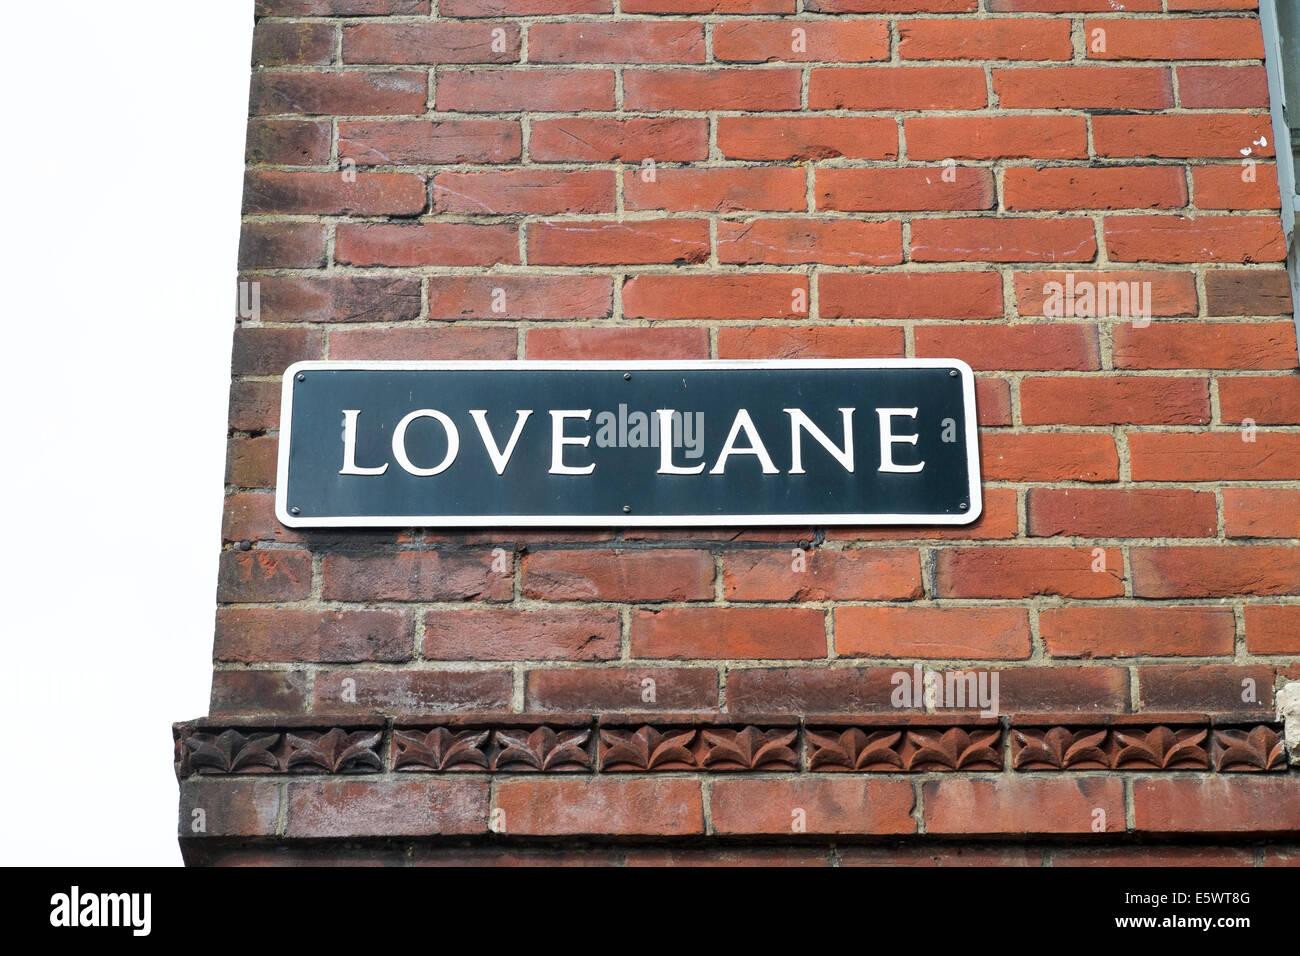 Love Lane street name sign on side of red brick building UK - Stock Image